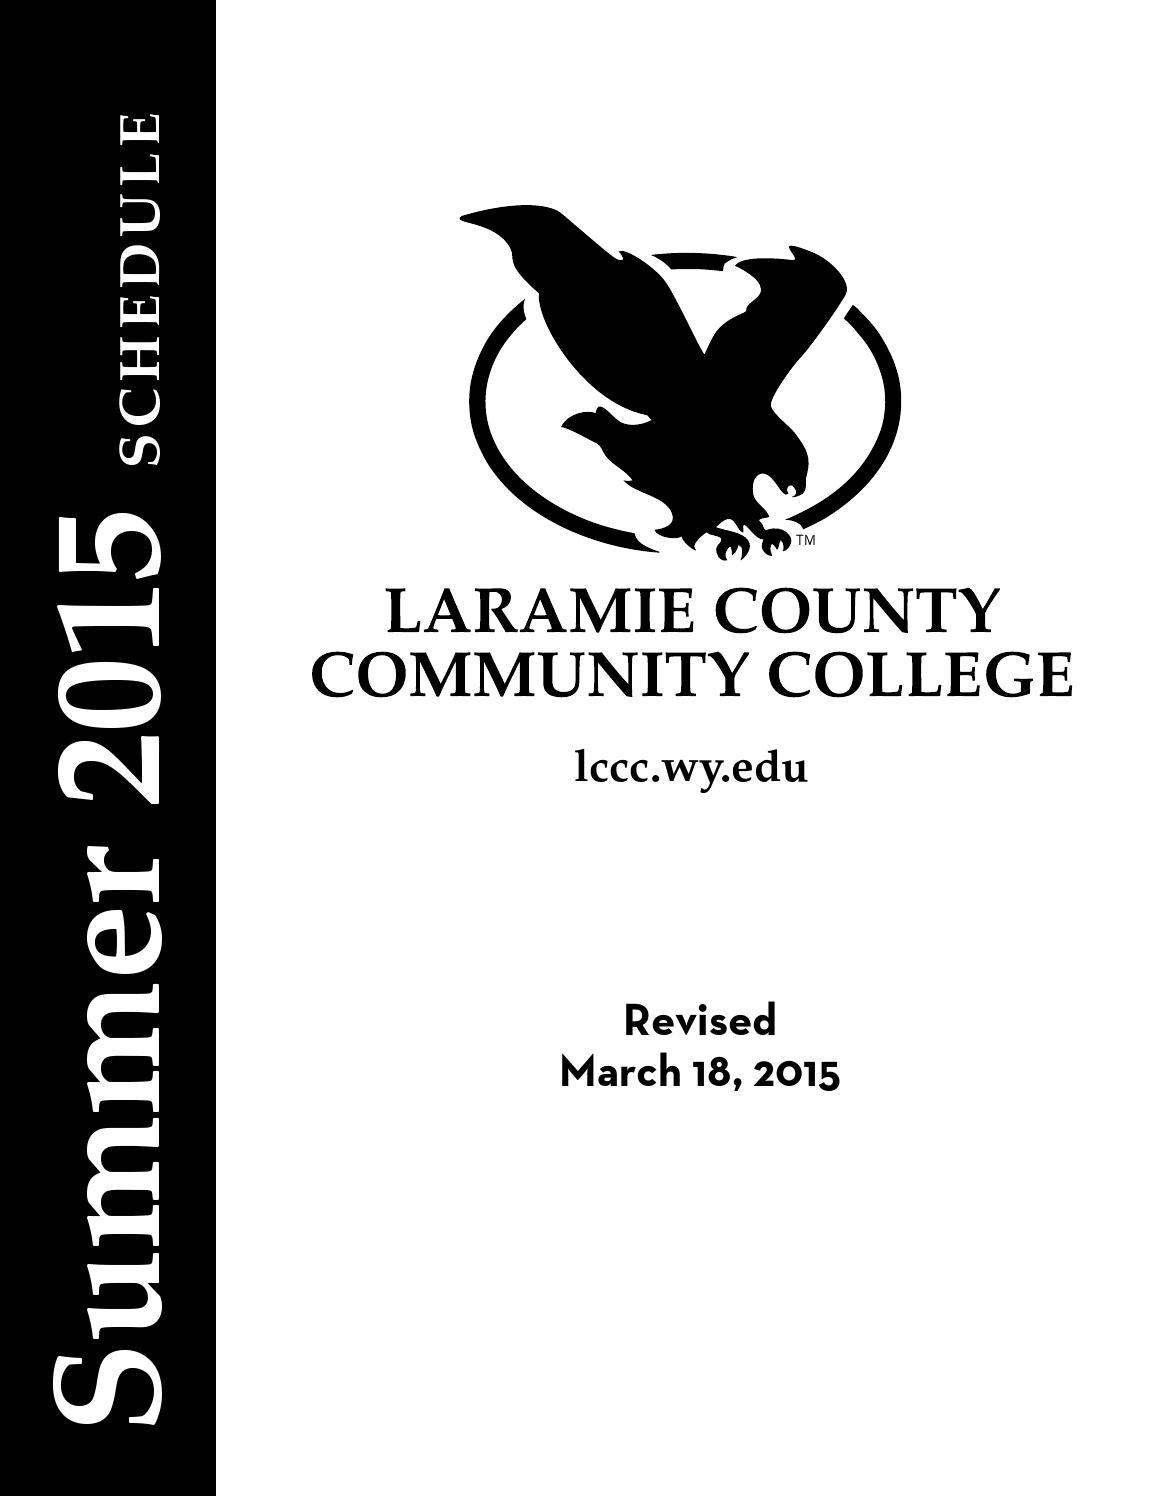 LCCC Summer 2015 Credit Schedule by Stacy Shultz-Bisset